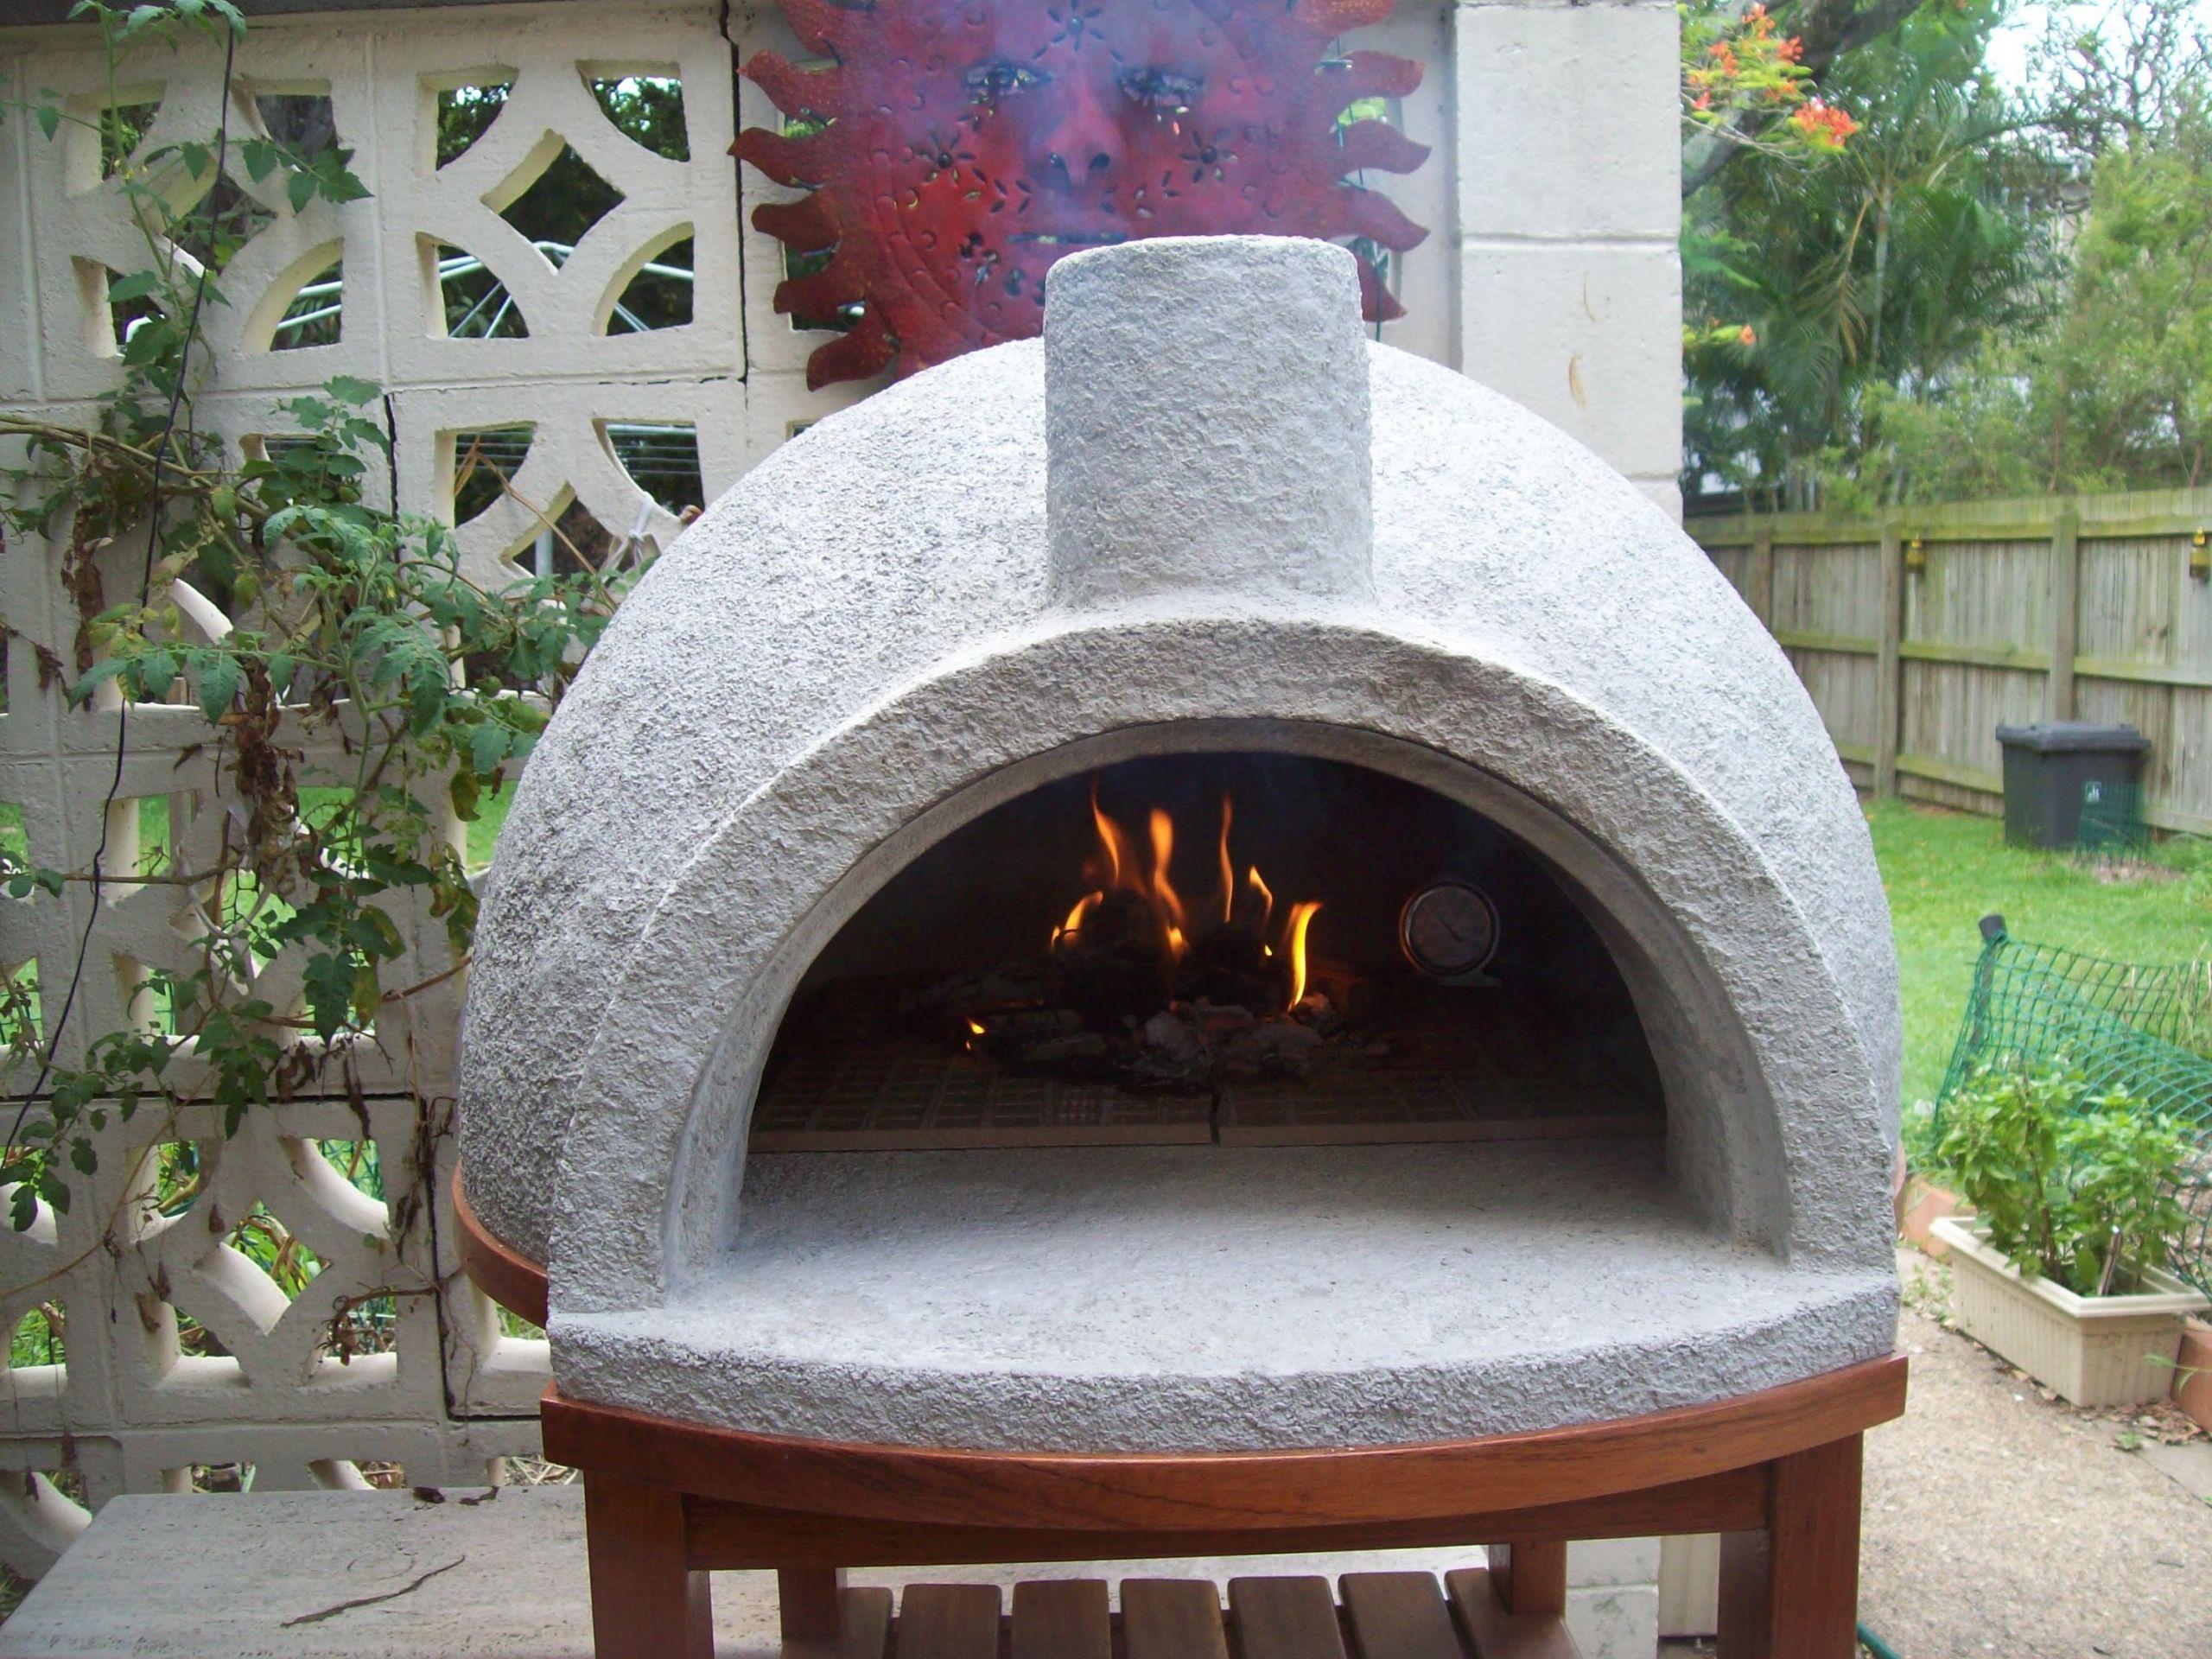 Outdoor Pizza Oven Plans DIY  vermiculite pizza oven